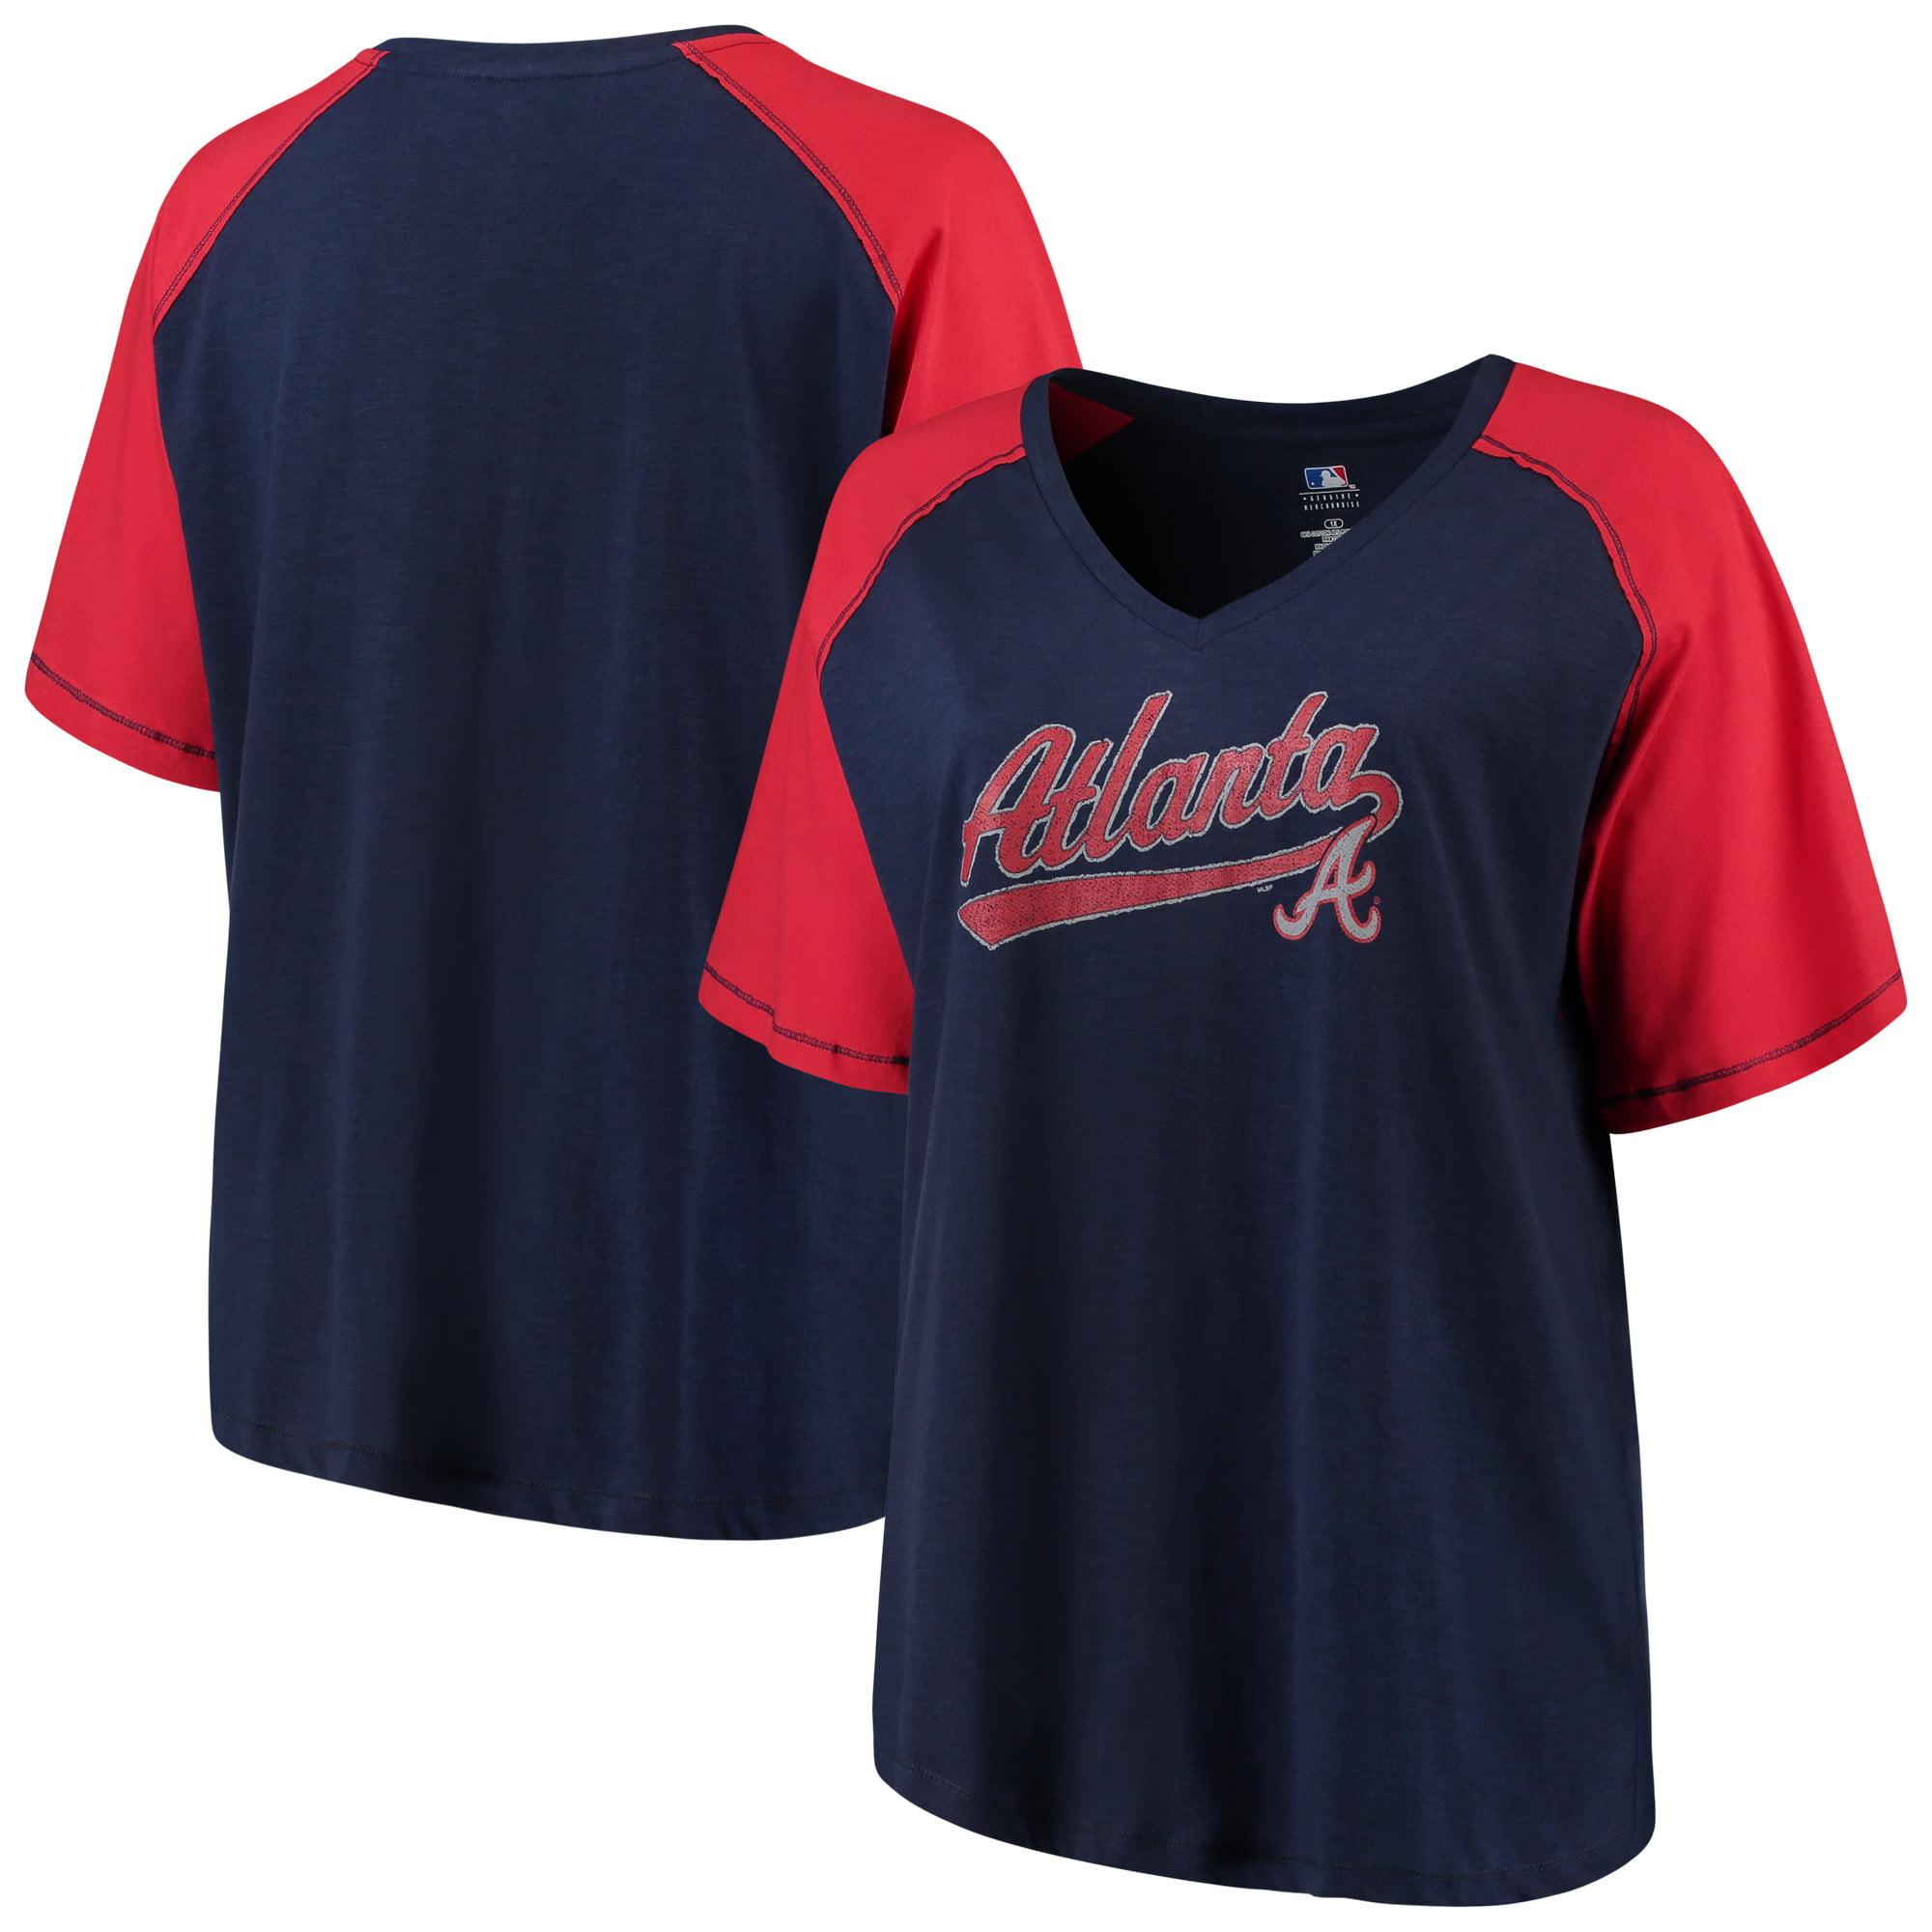 Women's Majestic Navy/Red Atlanta Braves Plus Size High Percentage Raglan V-Neck T-Shirt